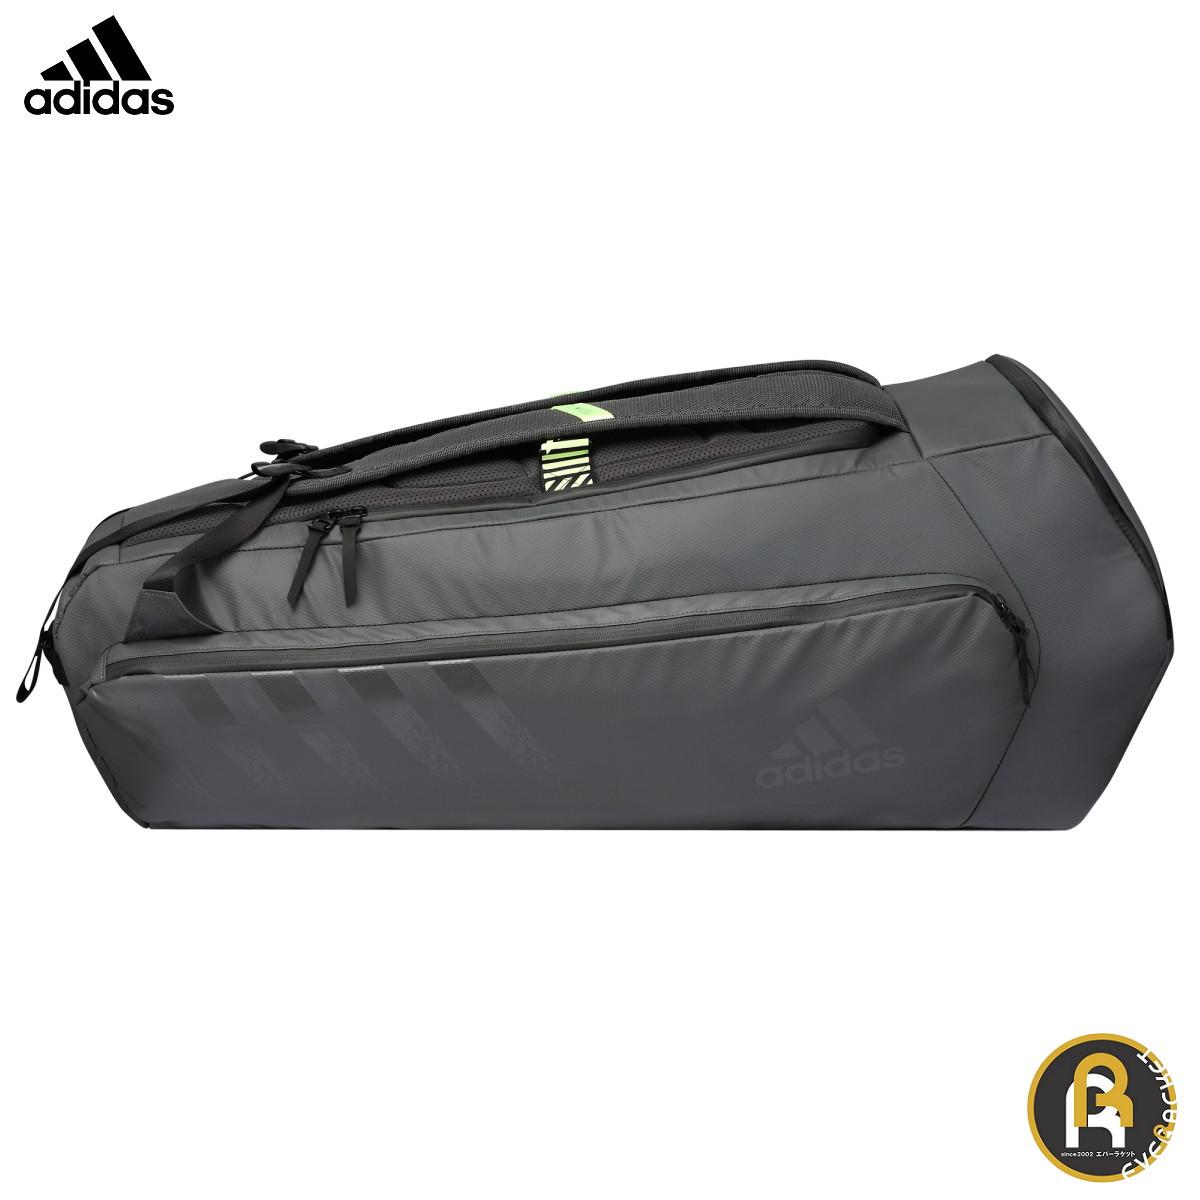 adidas アディダス バドミントン バッグ アーバン ラケットバッグ 6本入り BG920211